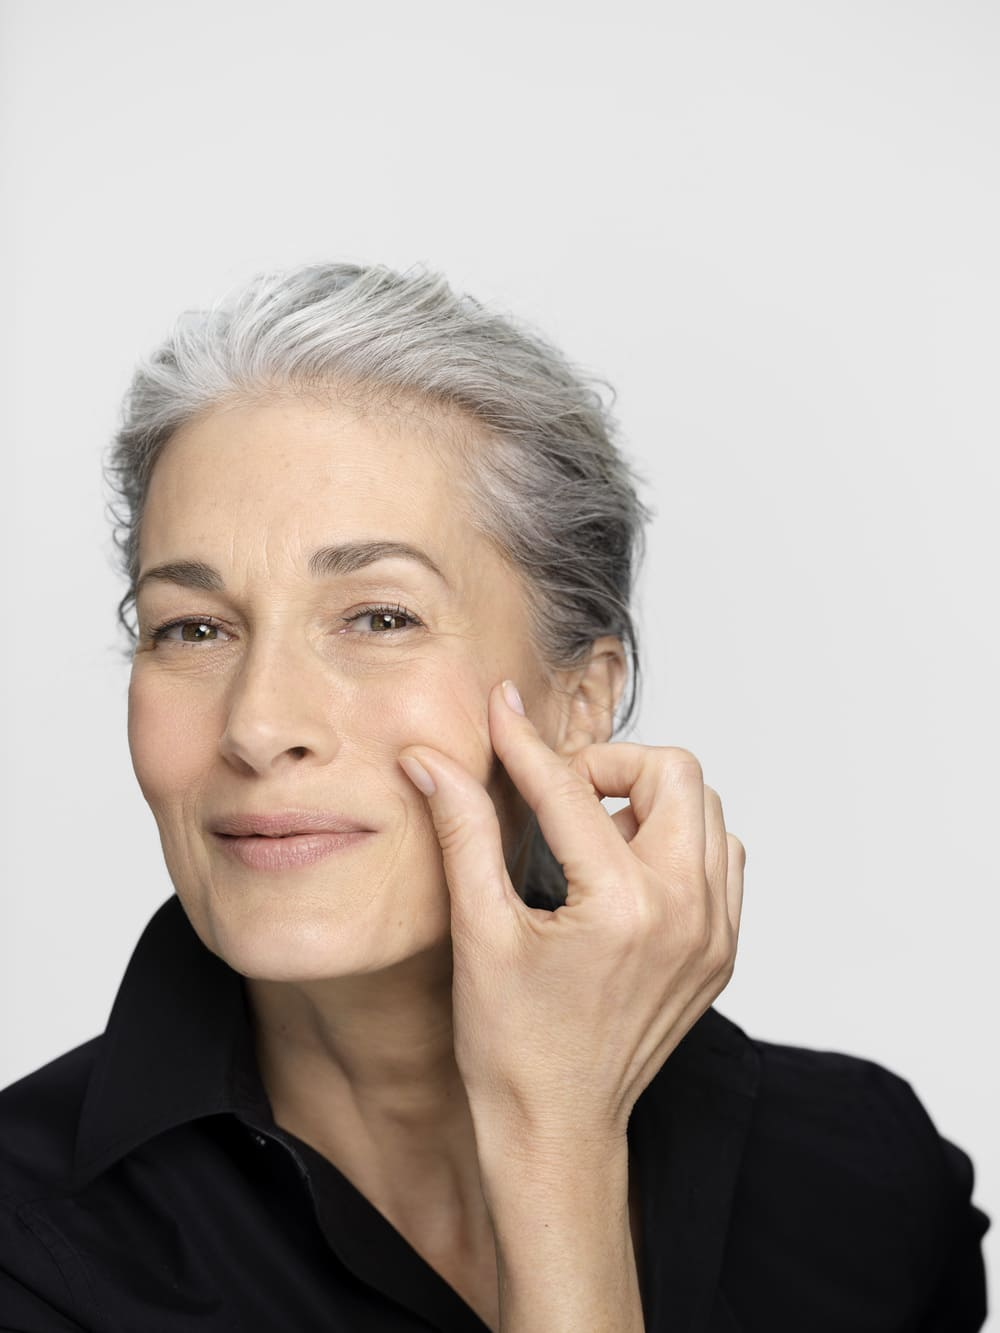 Scaderea productiei de hormoni la menopauza. Cum este afectat tenul?